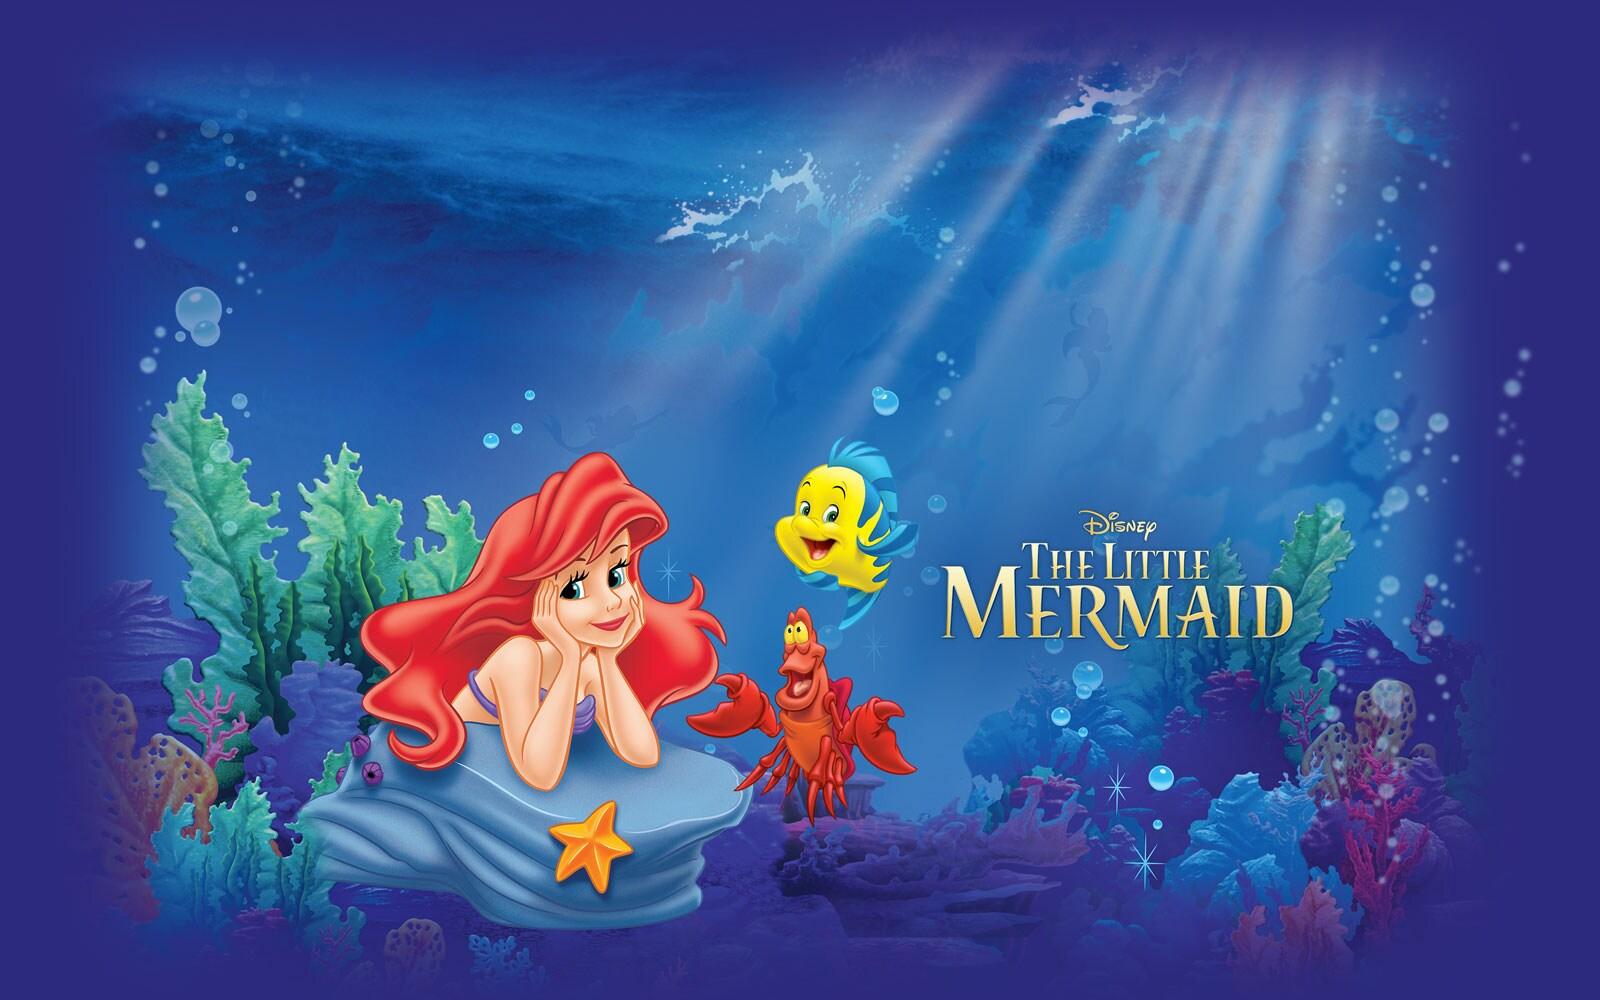 the little mermaid film u0026 character info disney uk